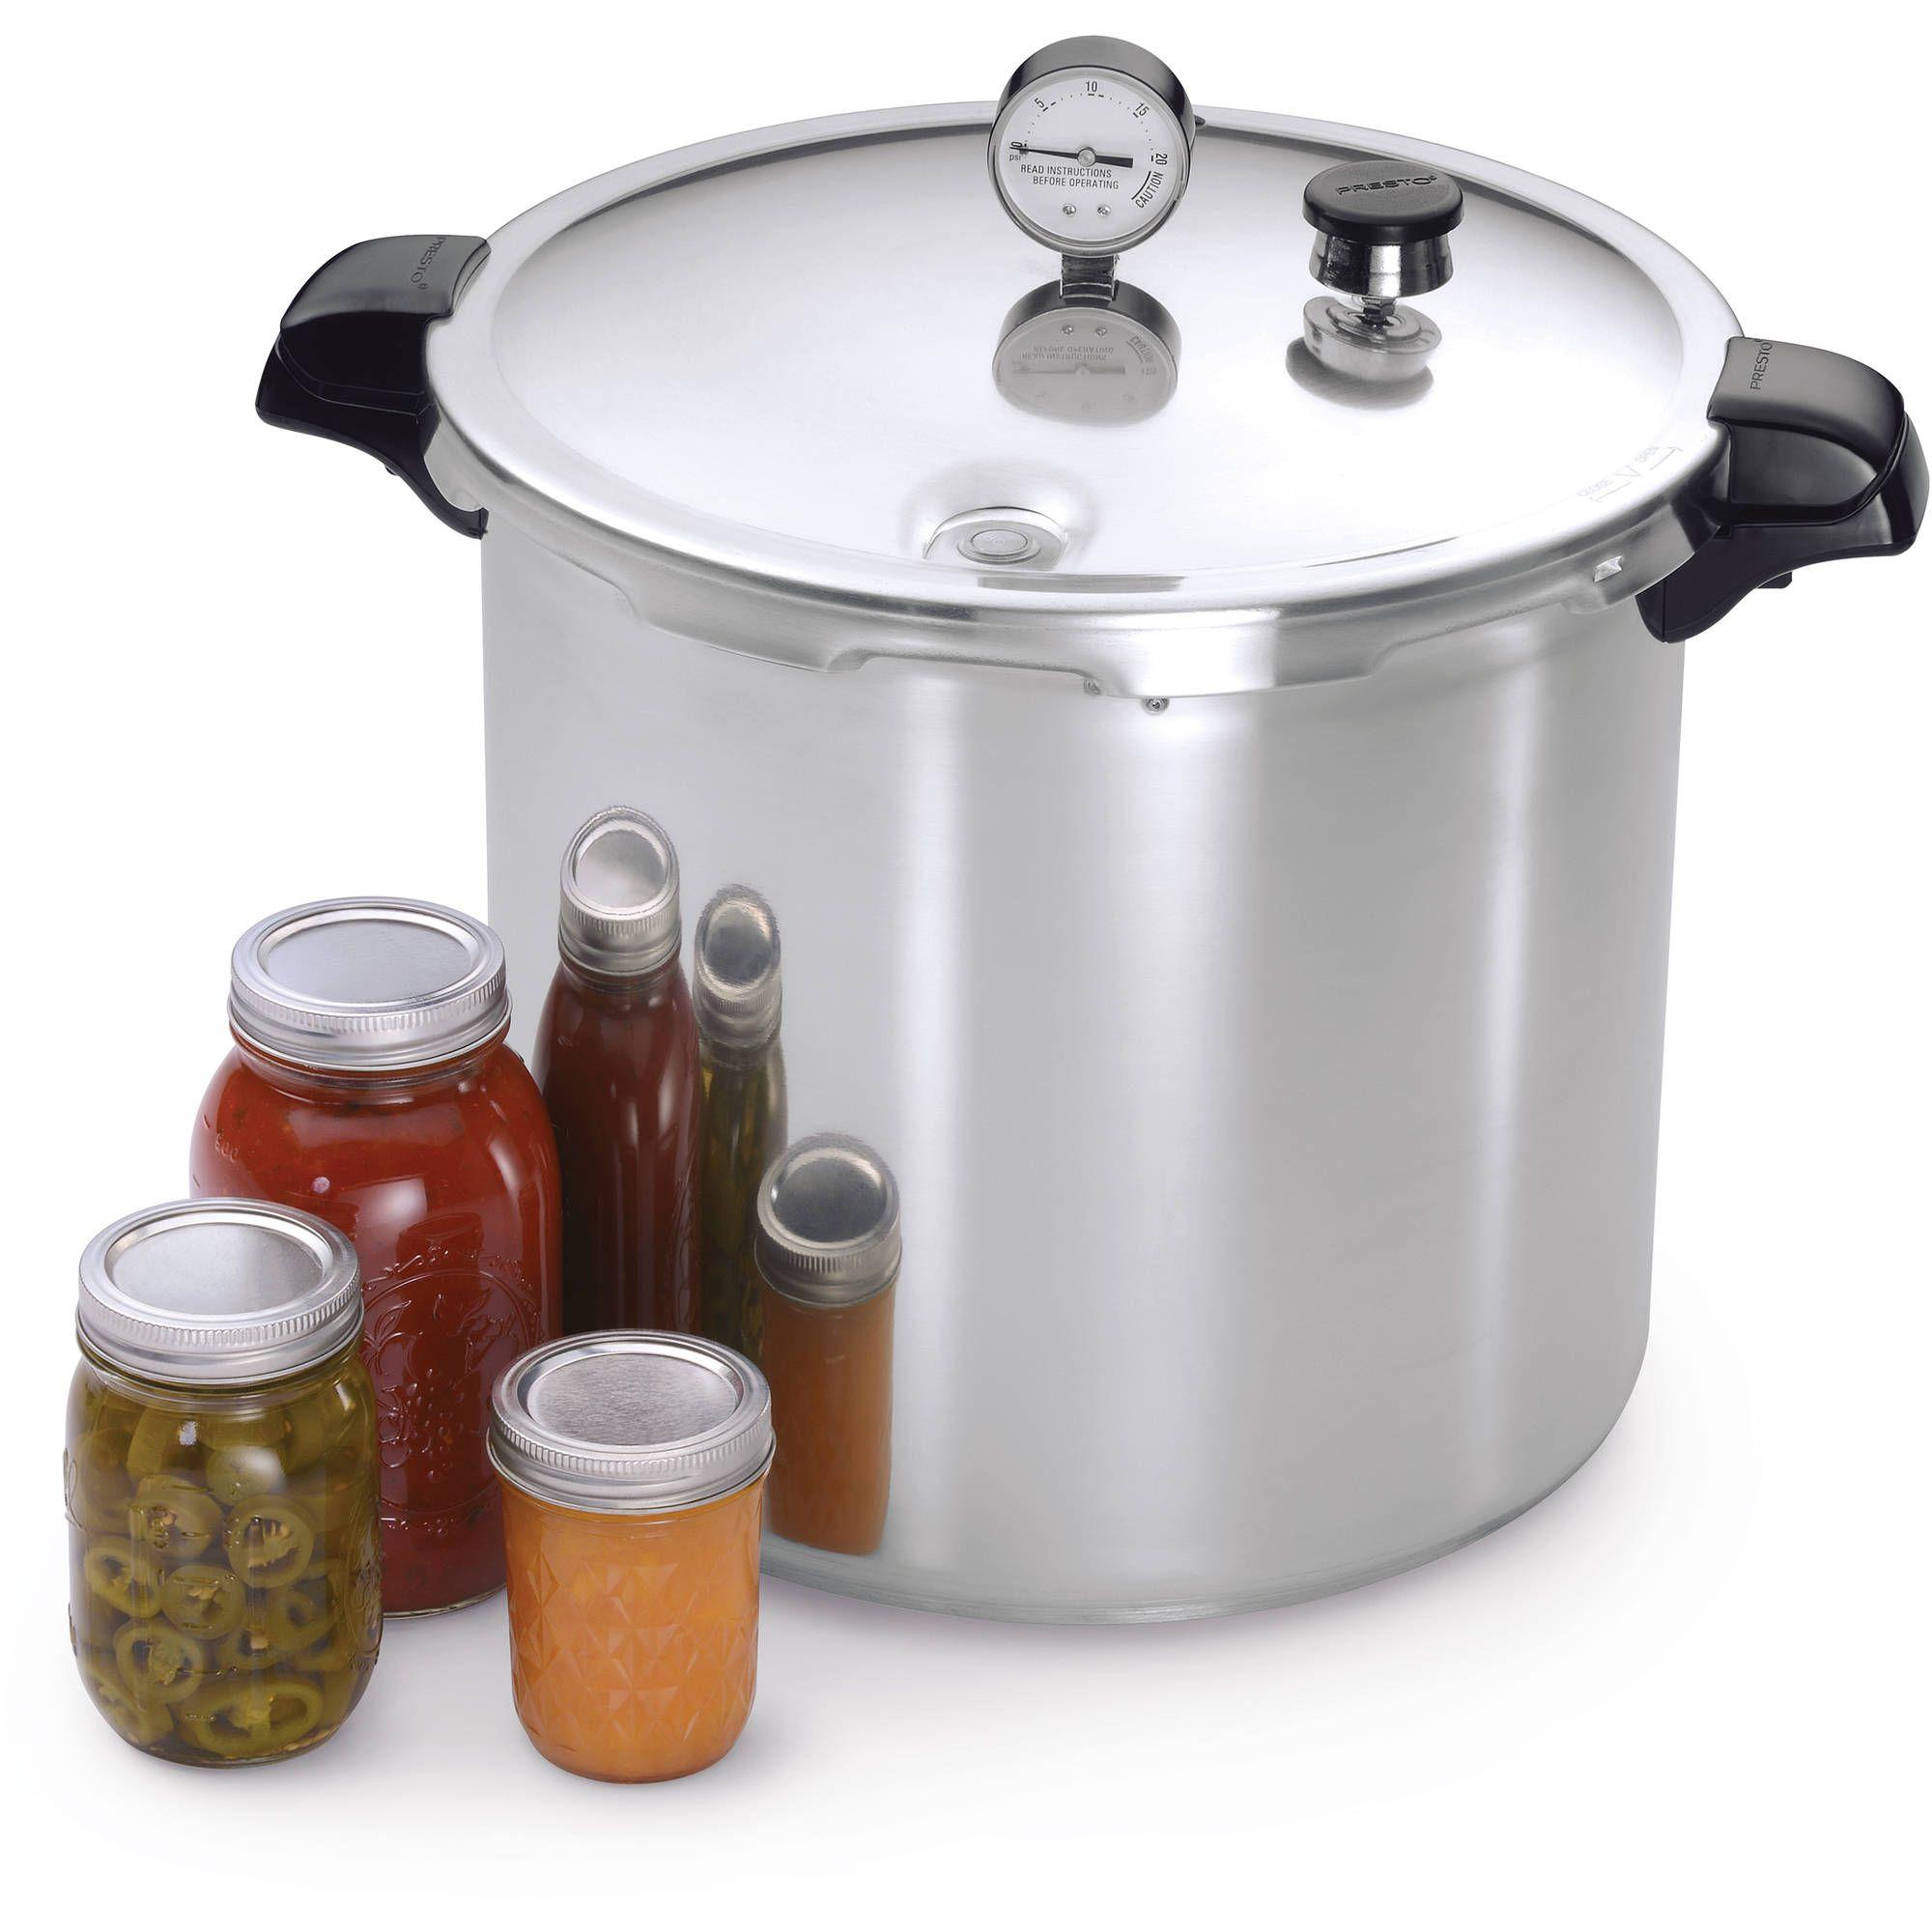 Presto 23-Quart Aluminum Pressure Canner Sale | Best Kitchen ...